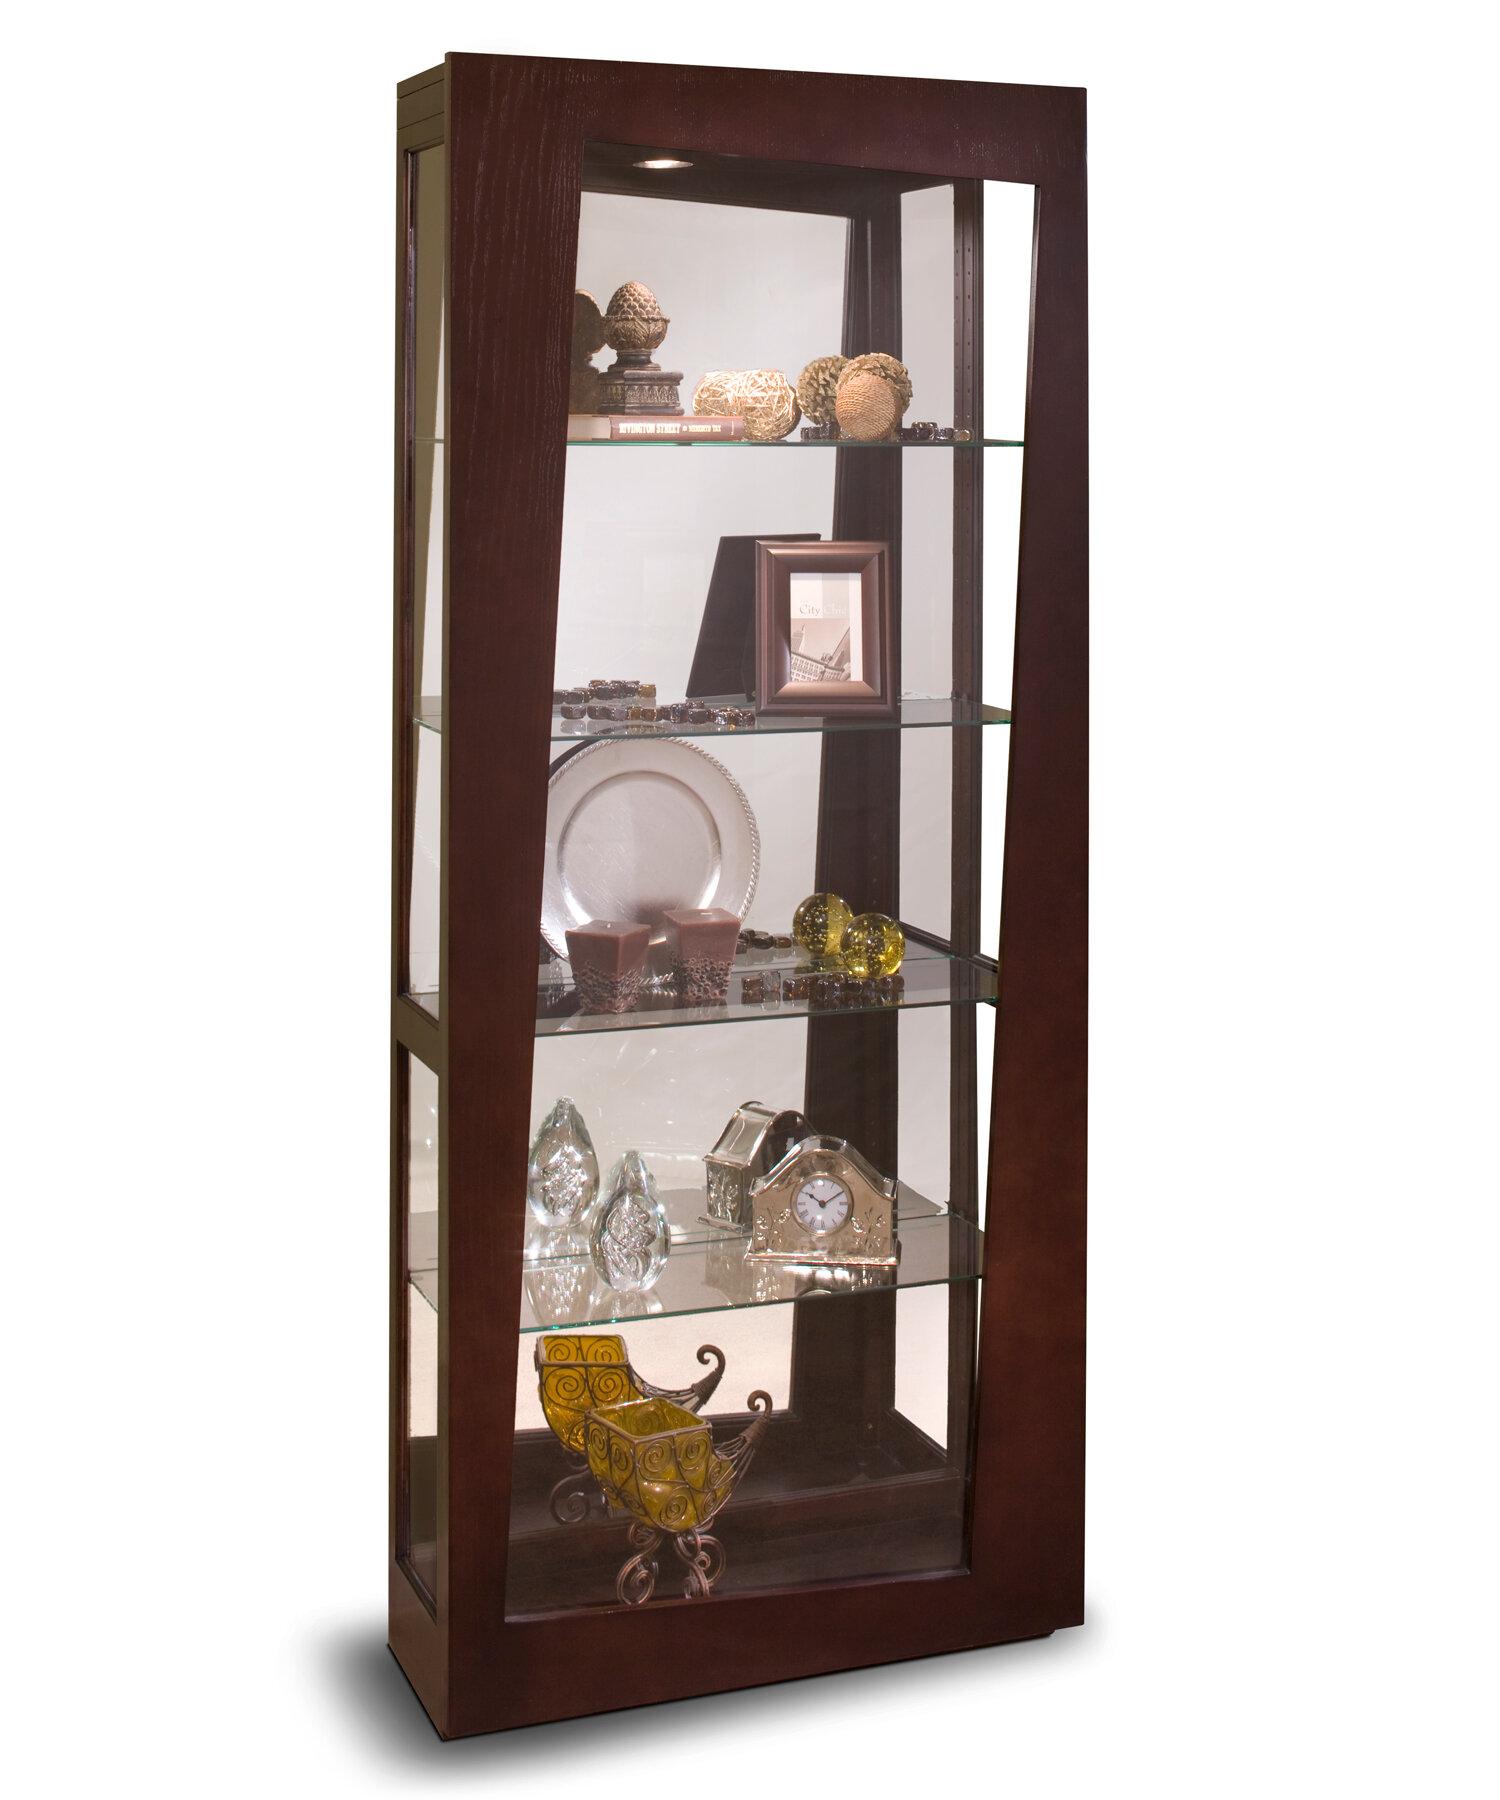 Philip Reinisch Co Lynx Curio Cabinet